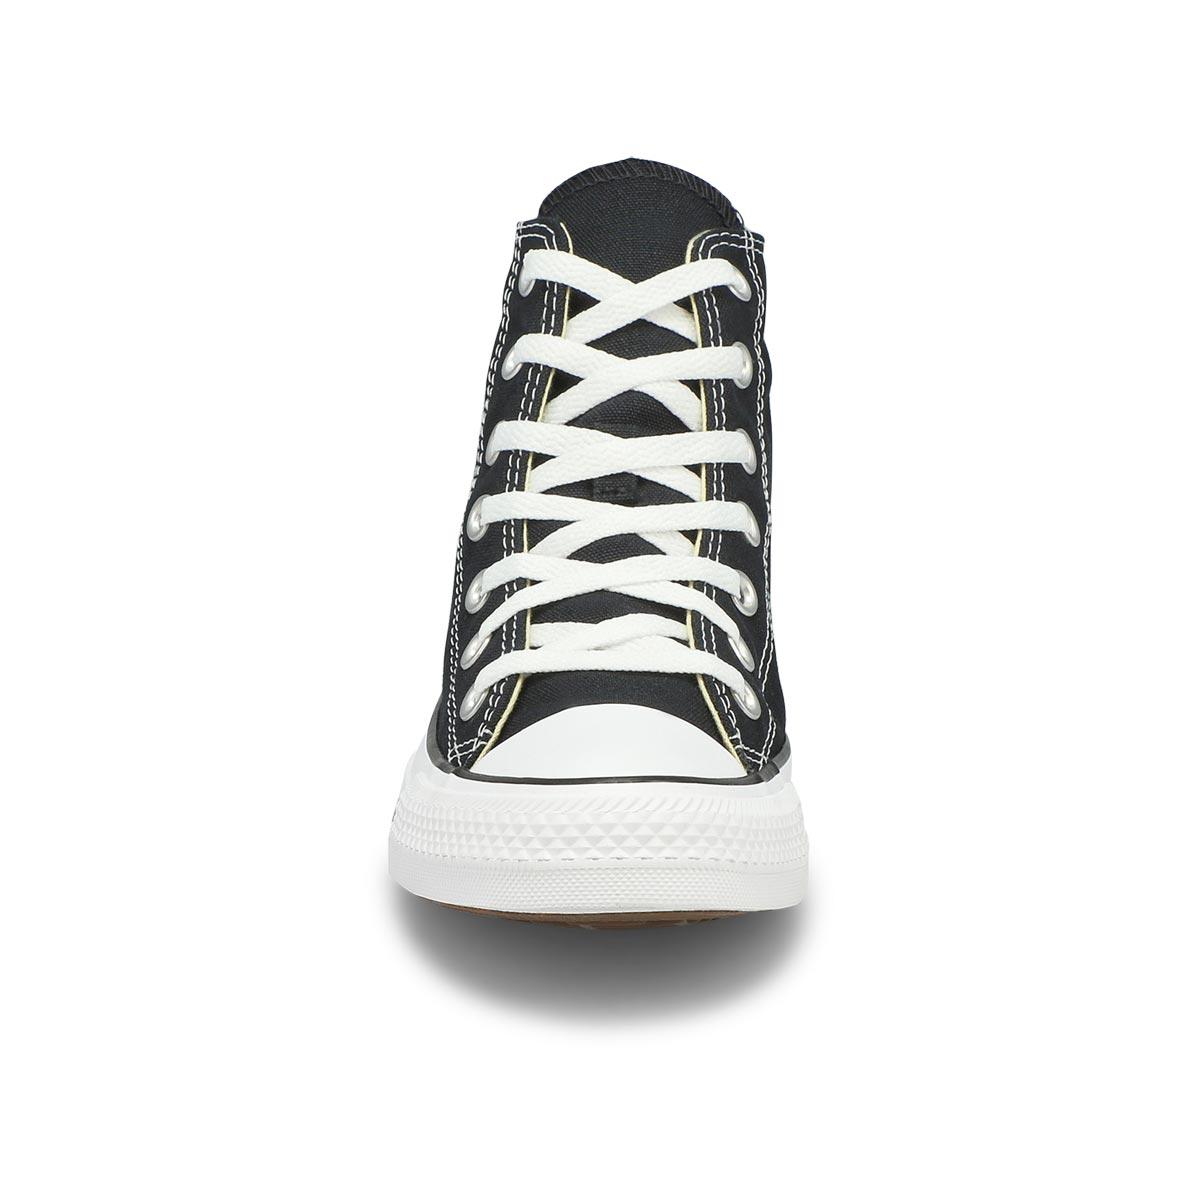 Lds CT All Star Core Hi blk sneaker